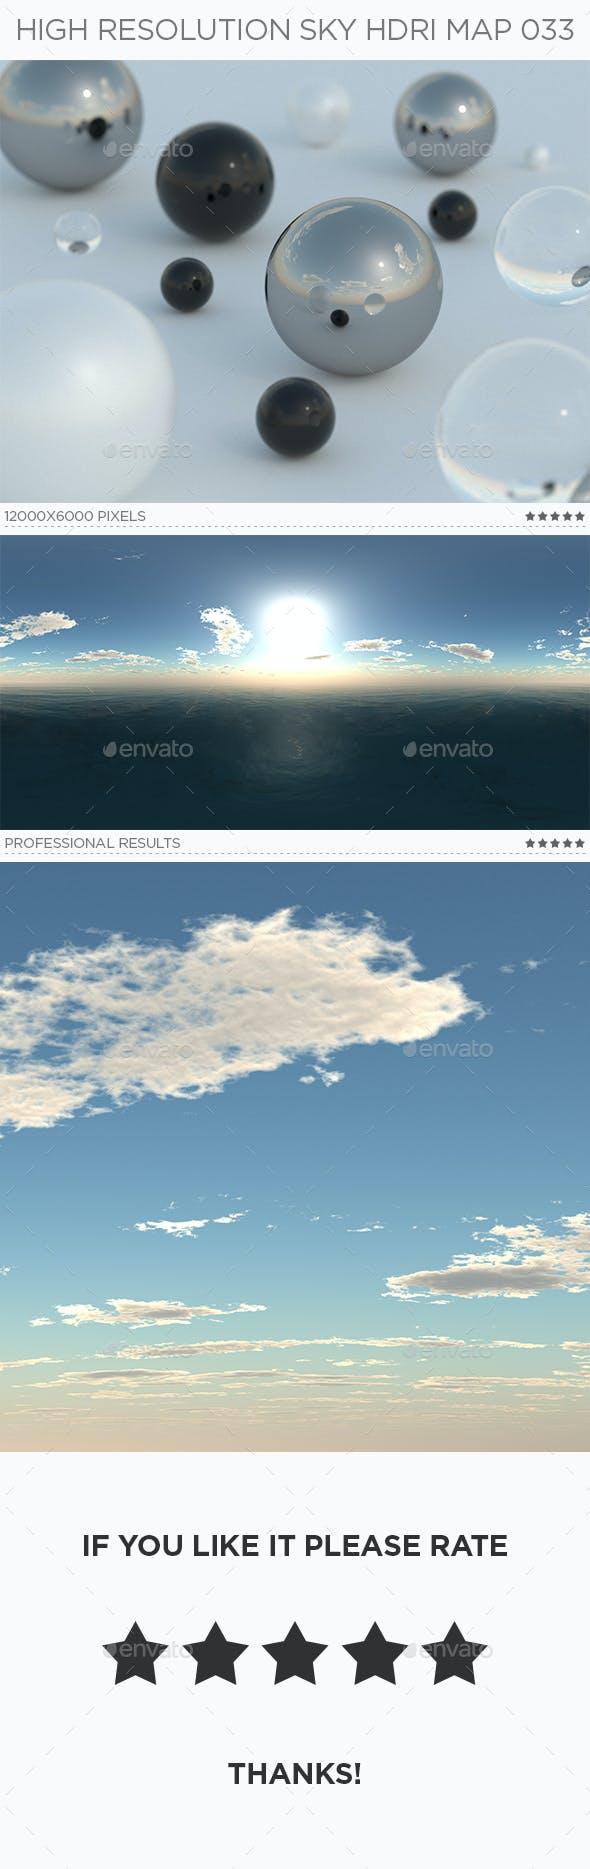 High Resolution Sky HDRi Map 033 - 3DOcean Item for Sale